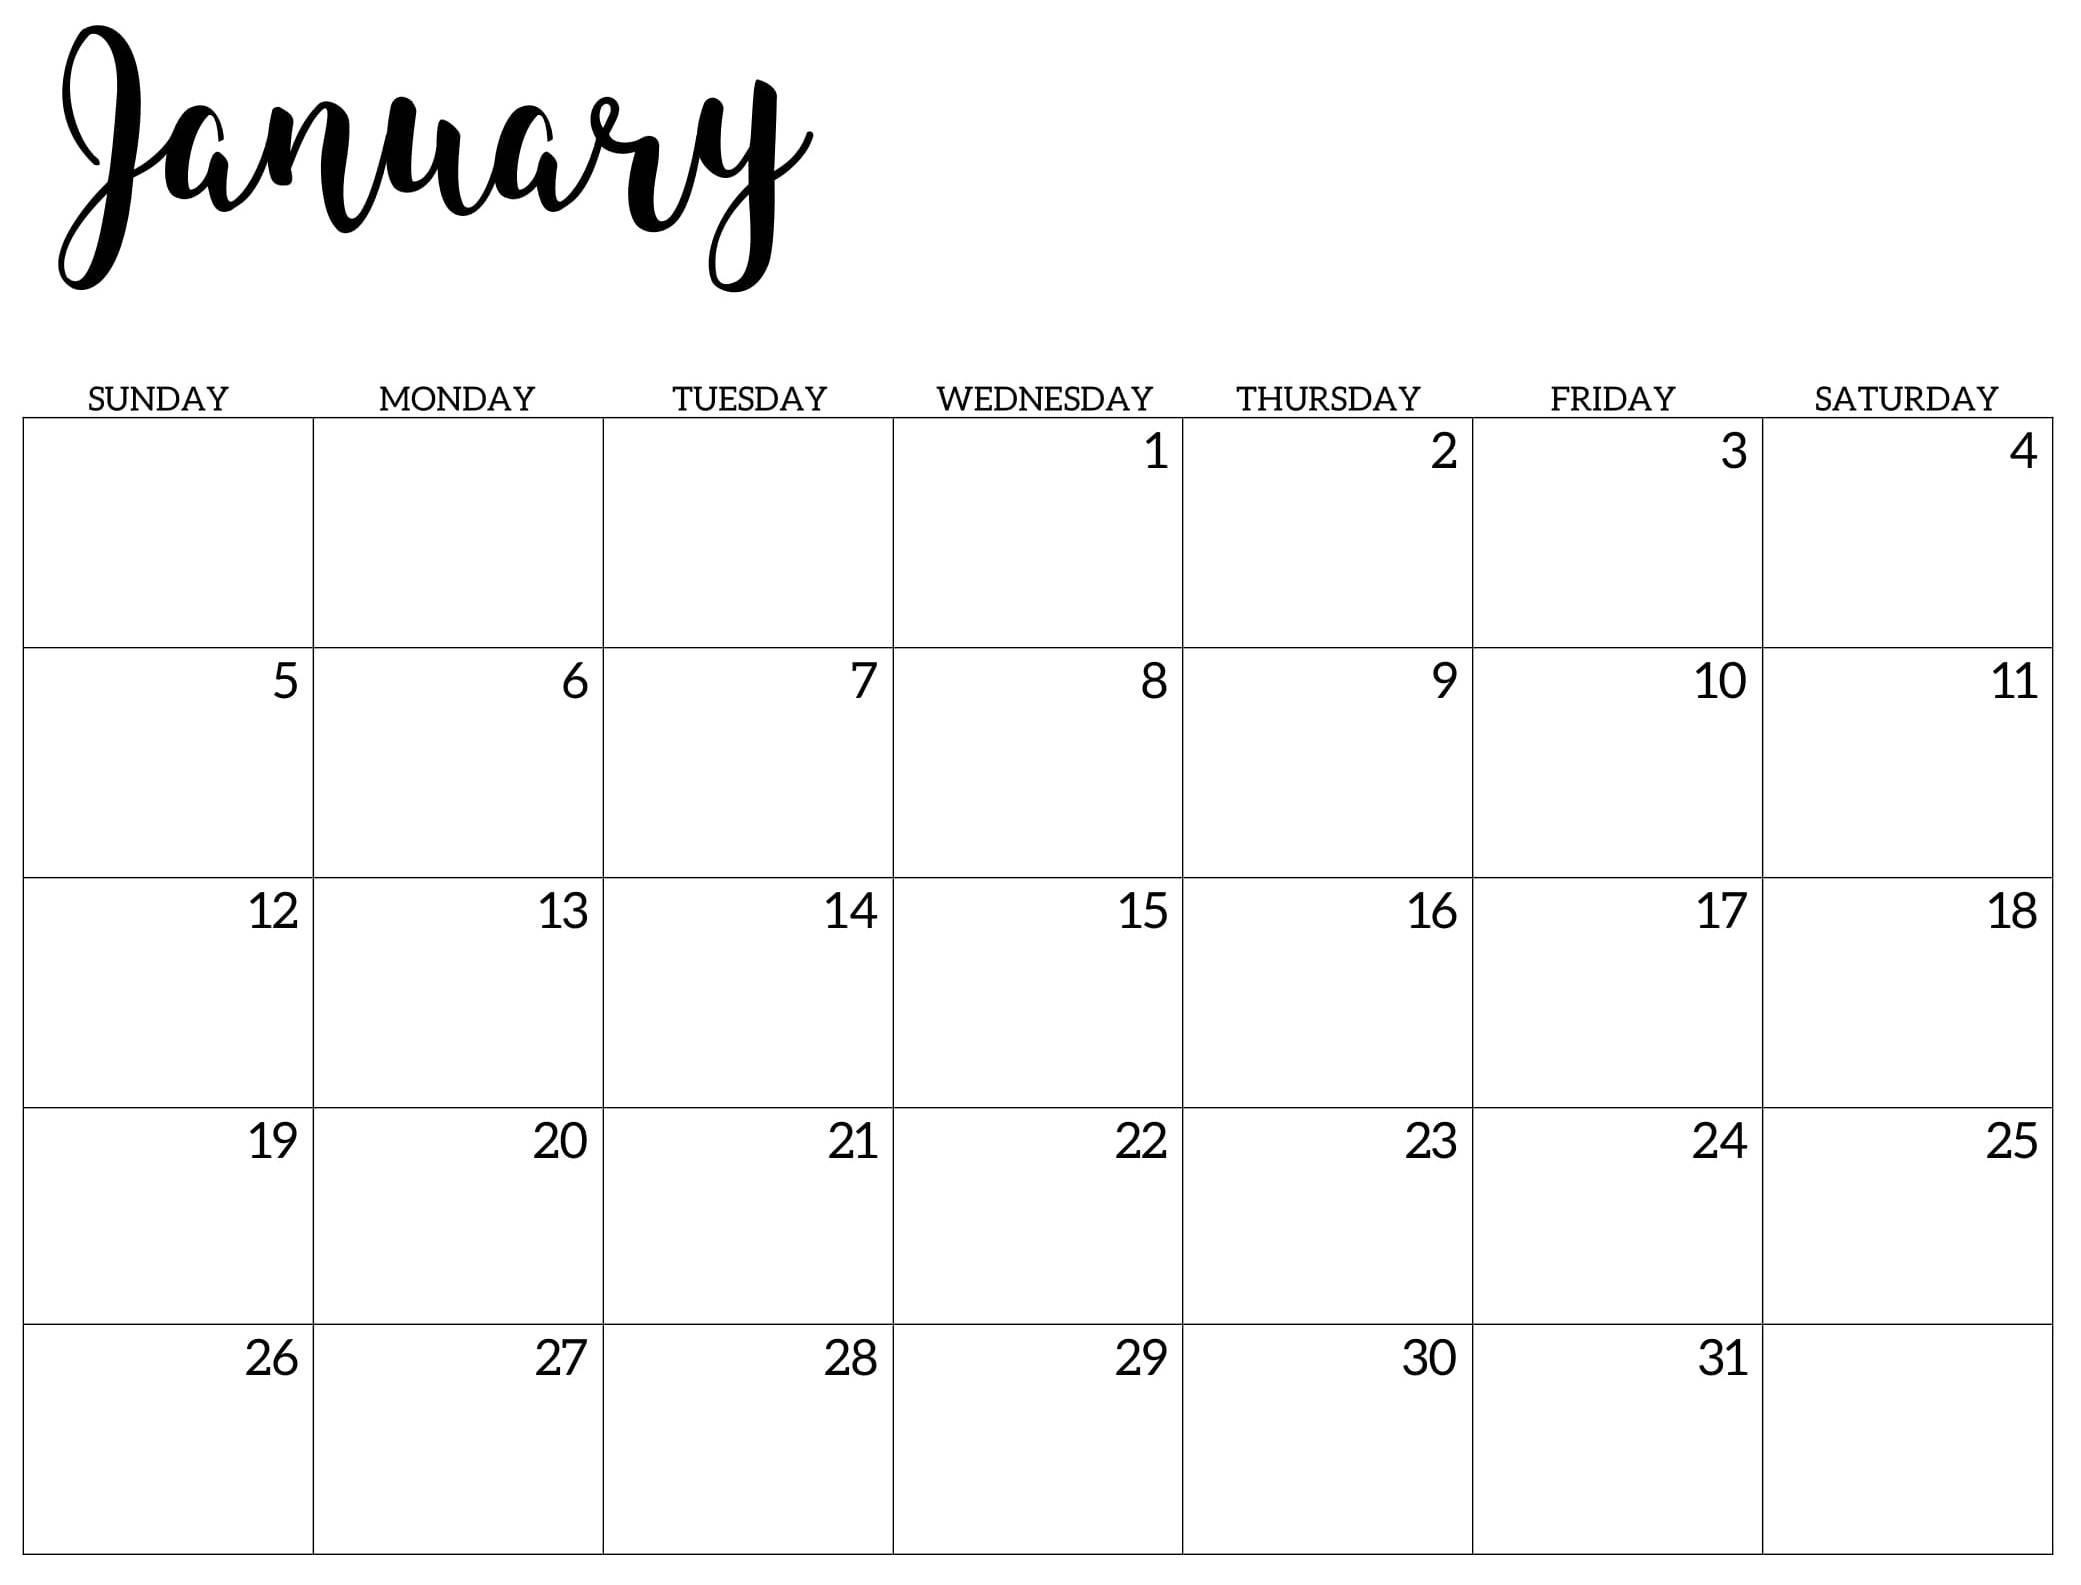 Free Cute January 2020 Calendar Printable | 12 Month